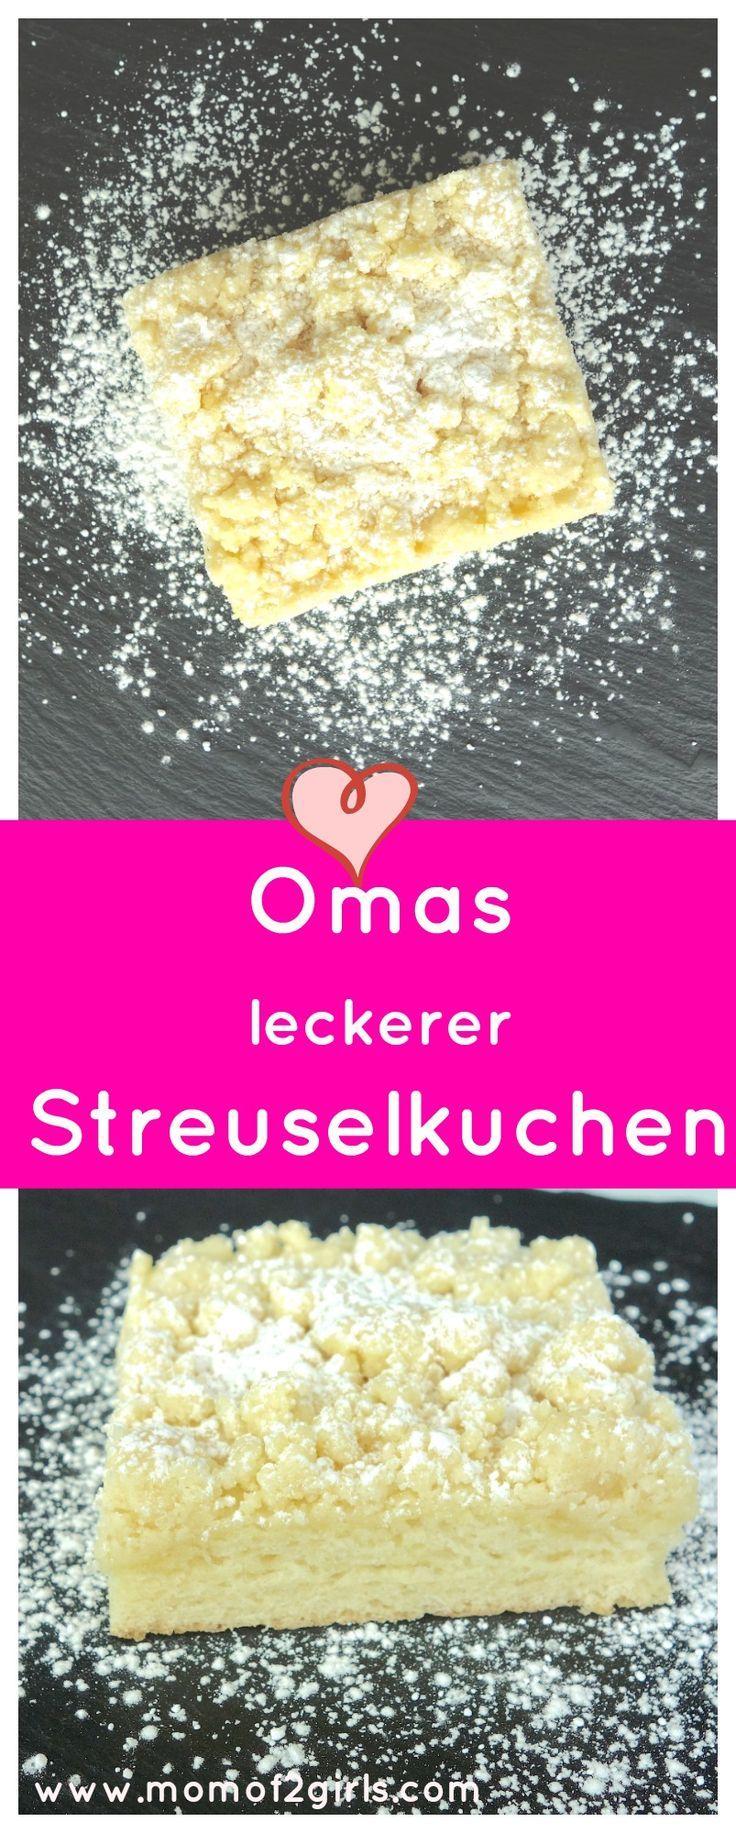 Omas leckerer Streuselkuchen #newgrandma